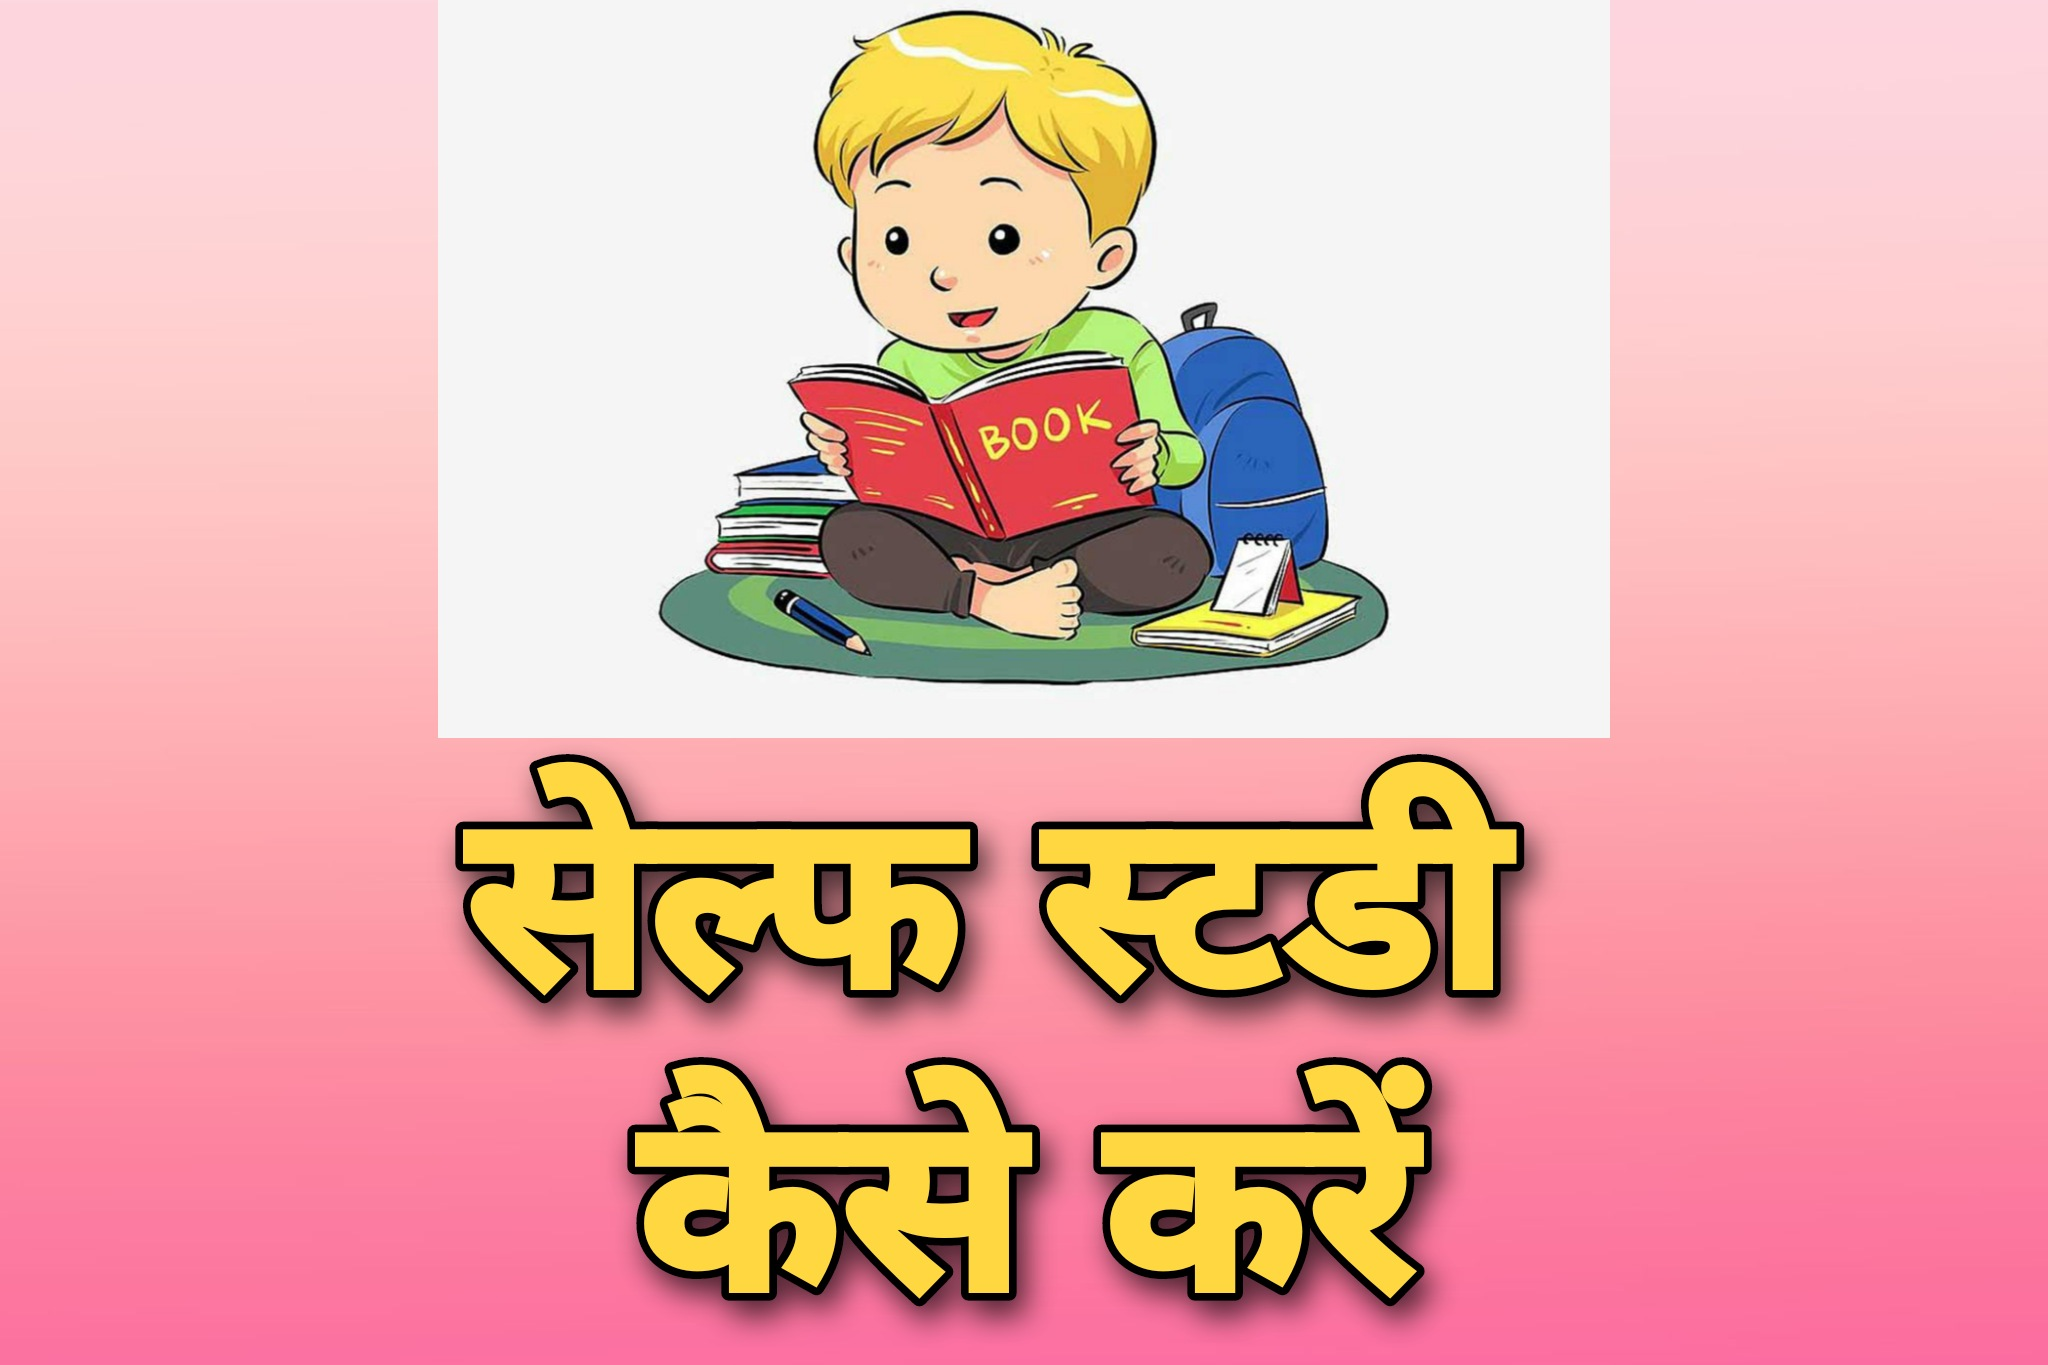 सेल्फ स्टडी कैसे करें, Self Study Tips in Hindi, self study kaise karen,